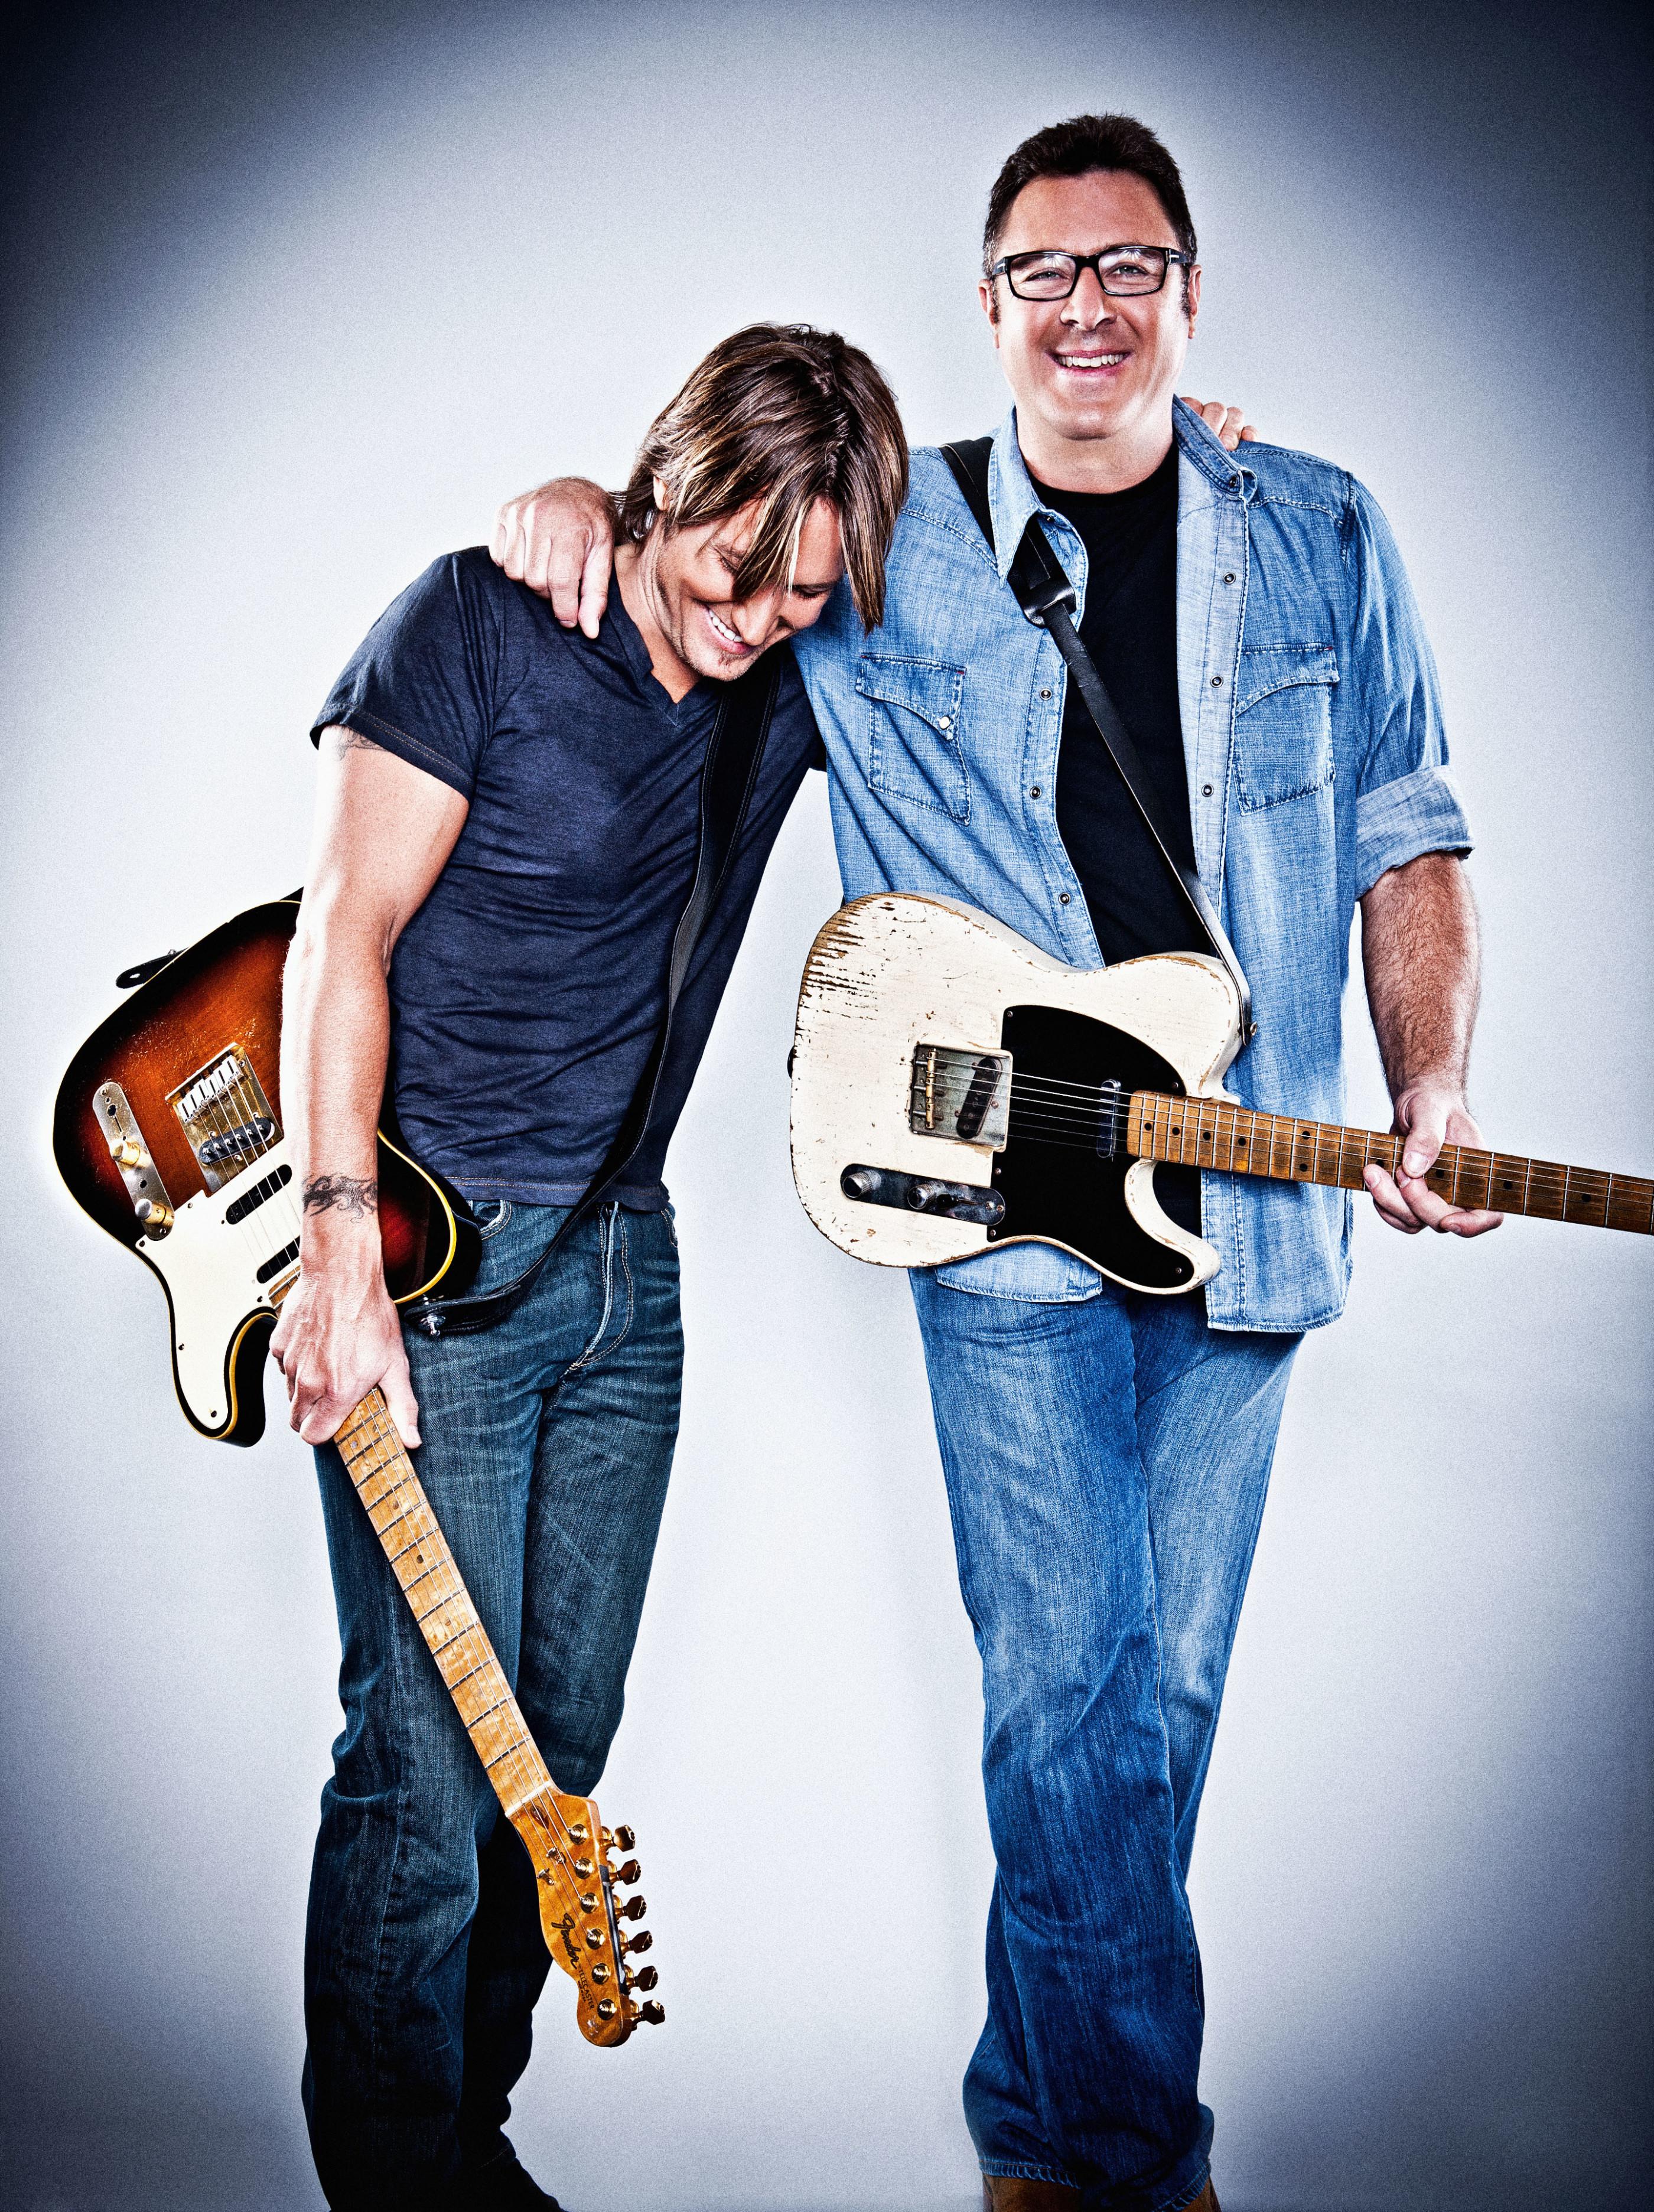 Keith Urban and Vince Gill